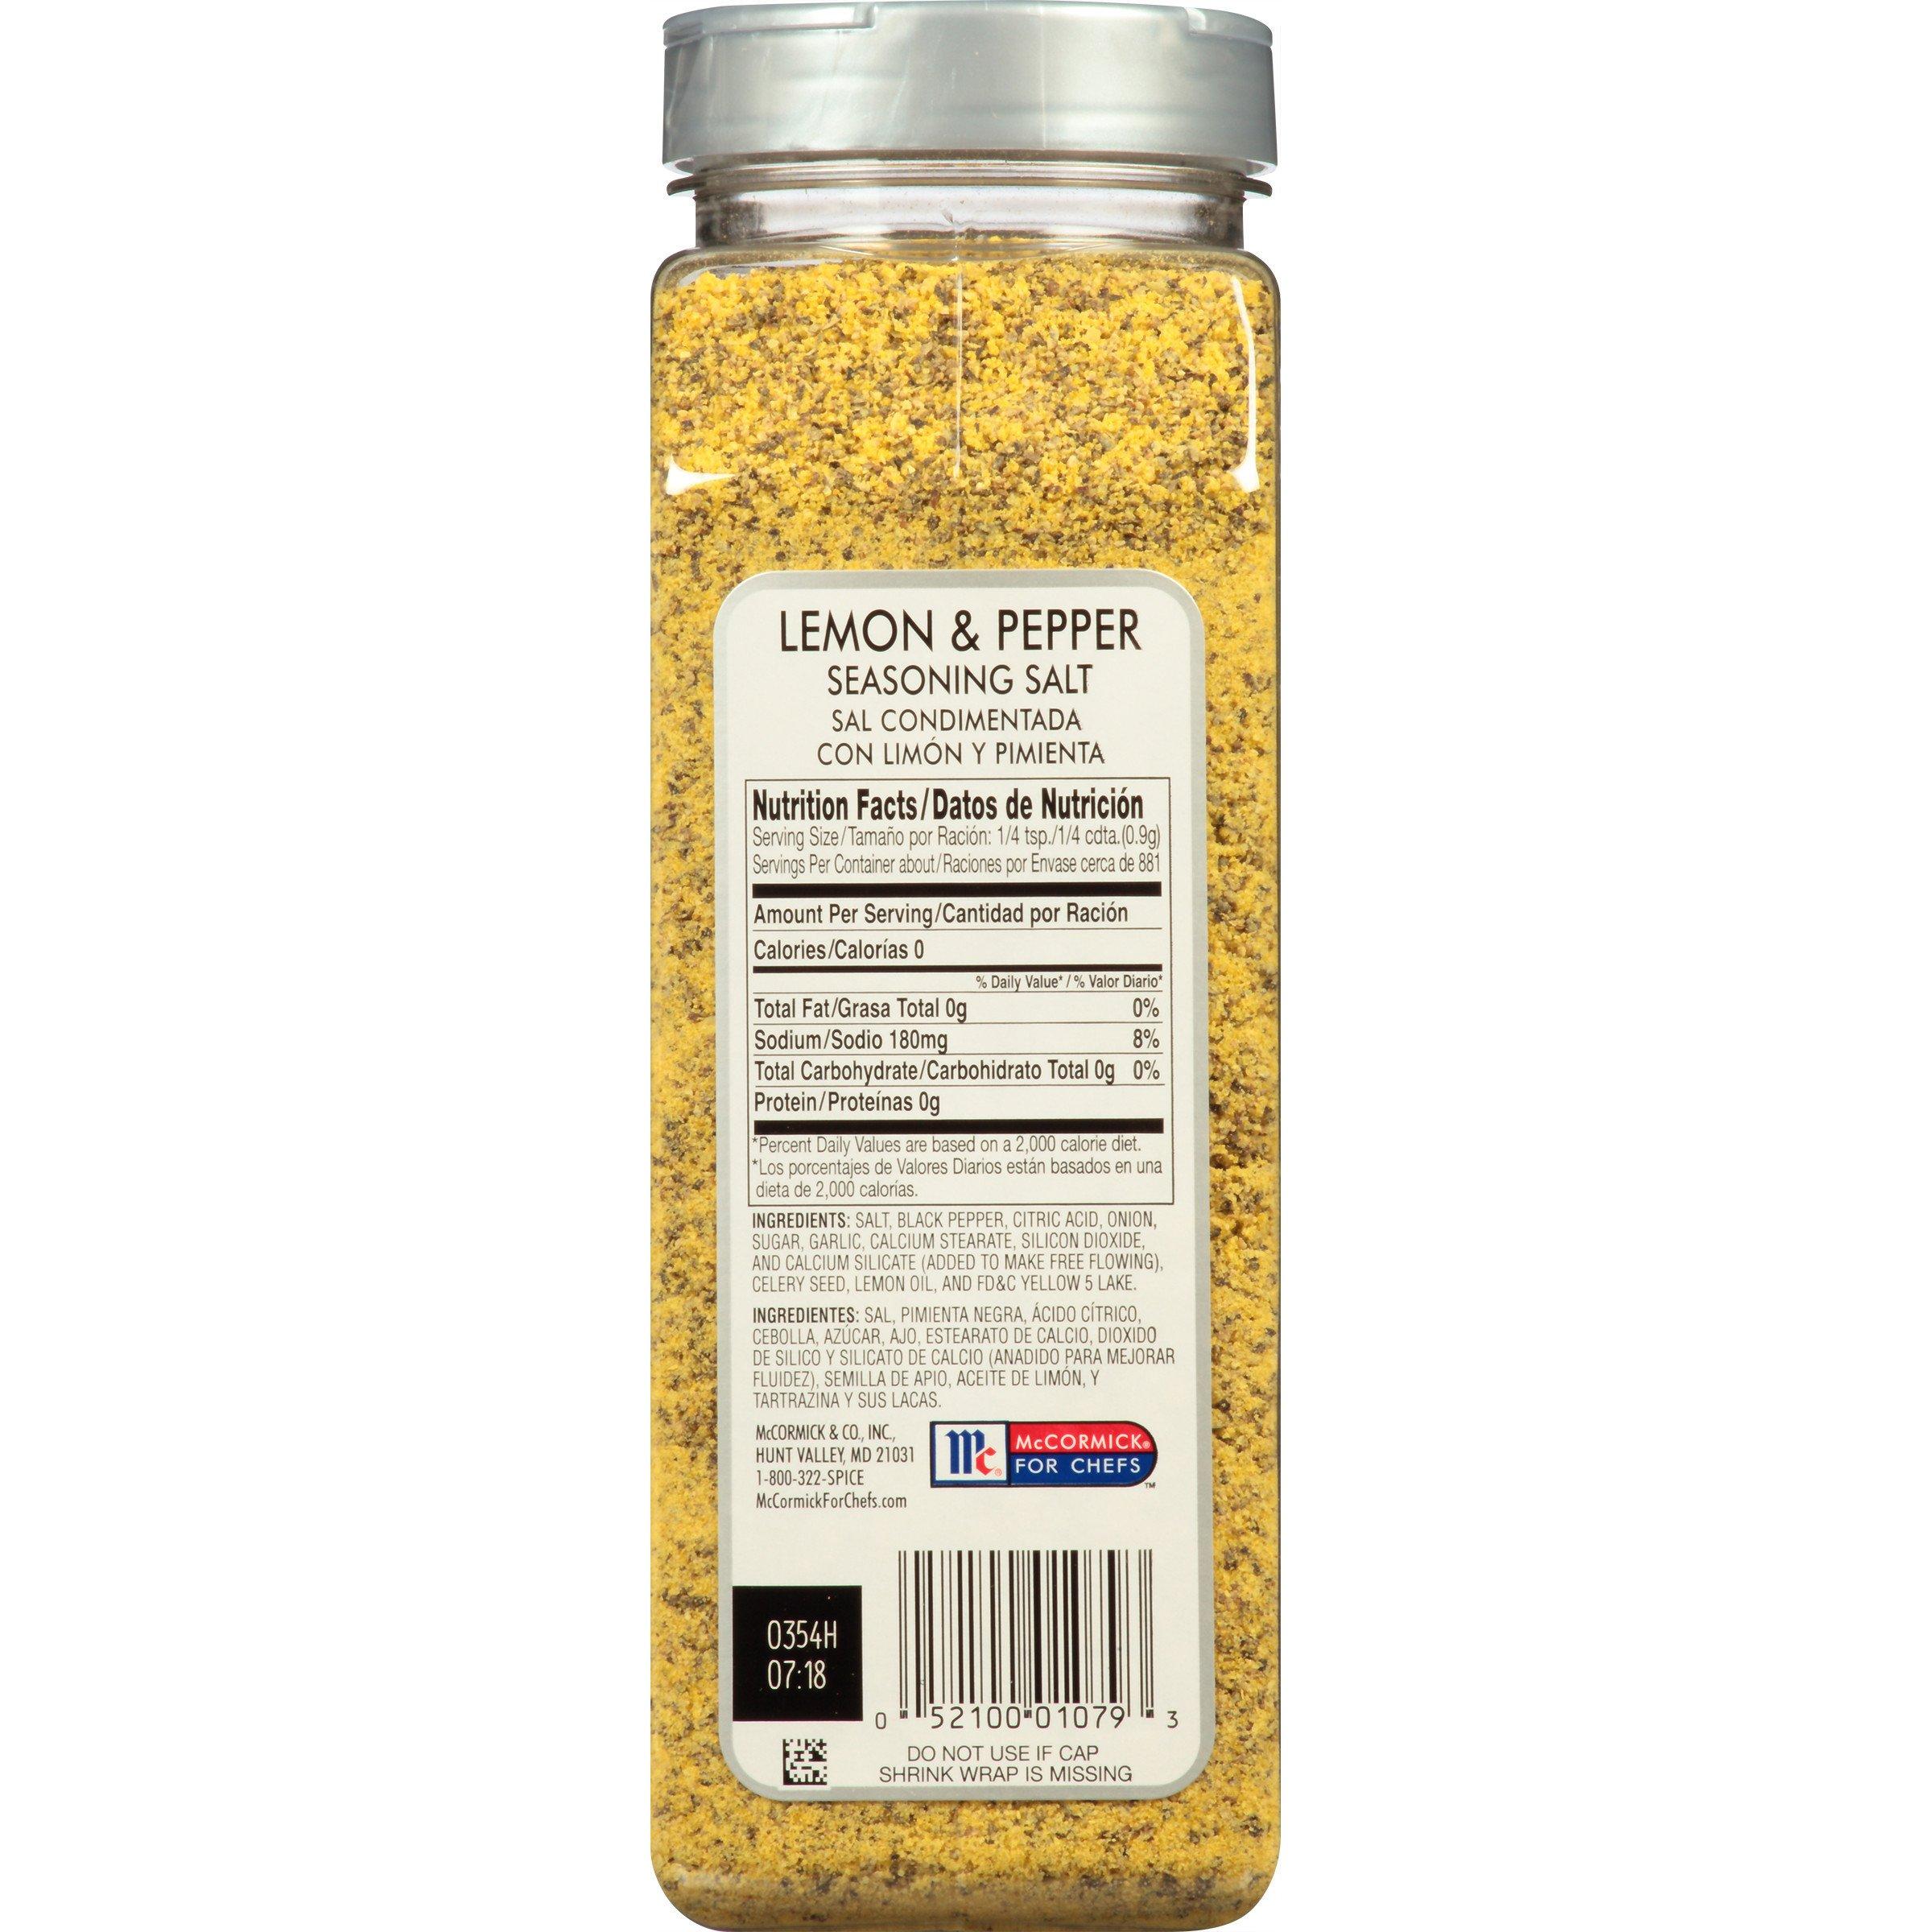 McCormick Culinary Lemon & Pepper Seasoning Salt, 28 oz by McCormick (Image #3)